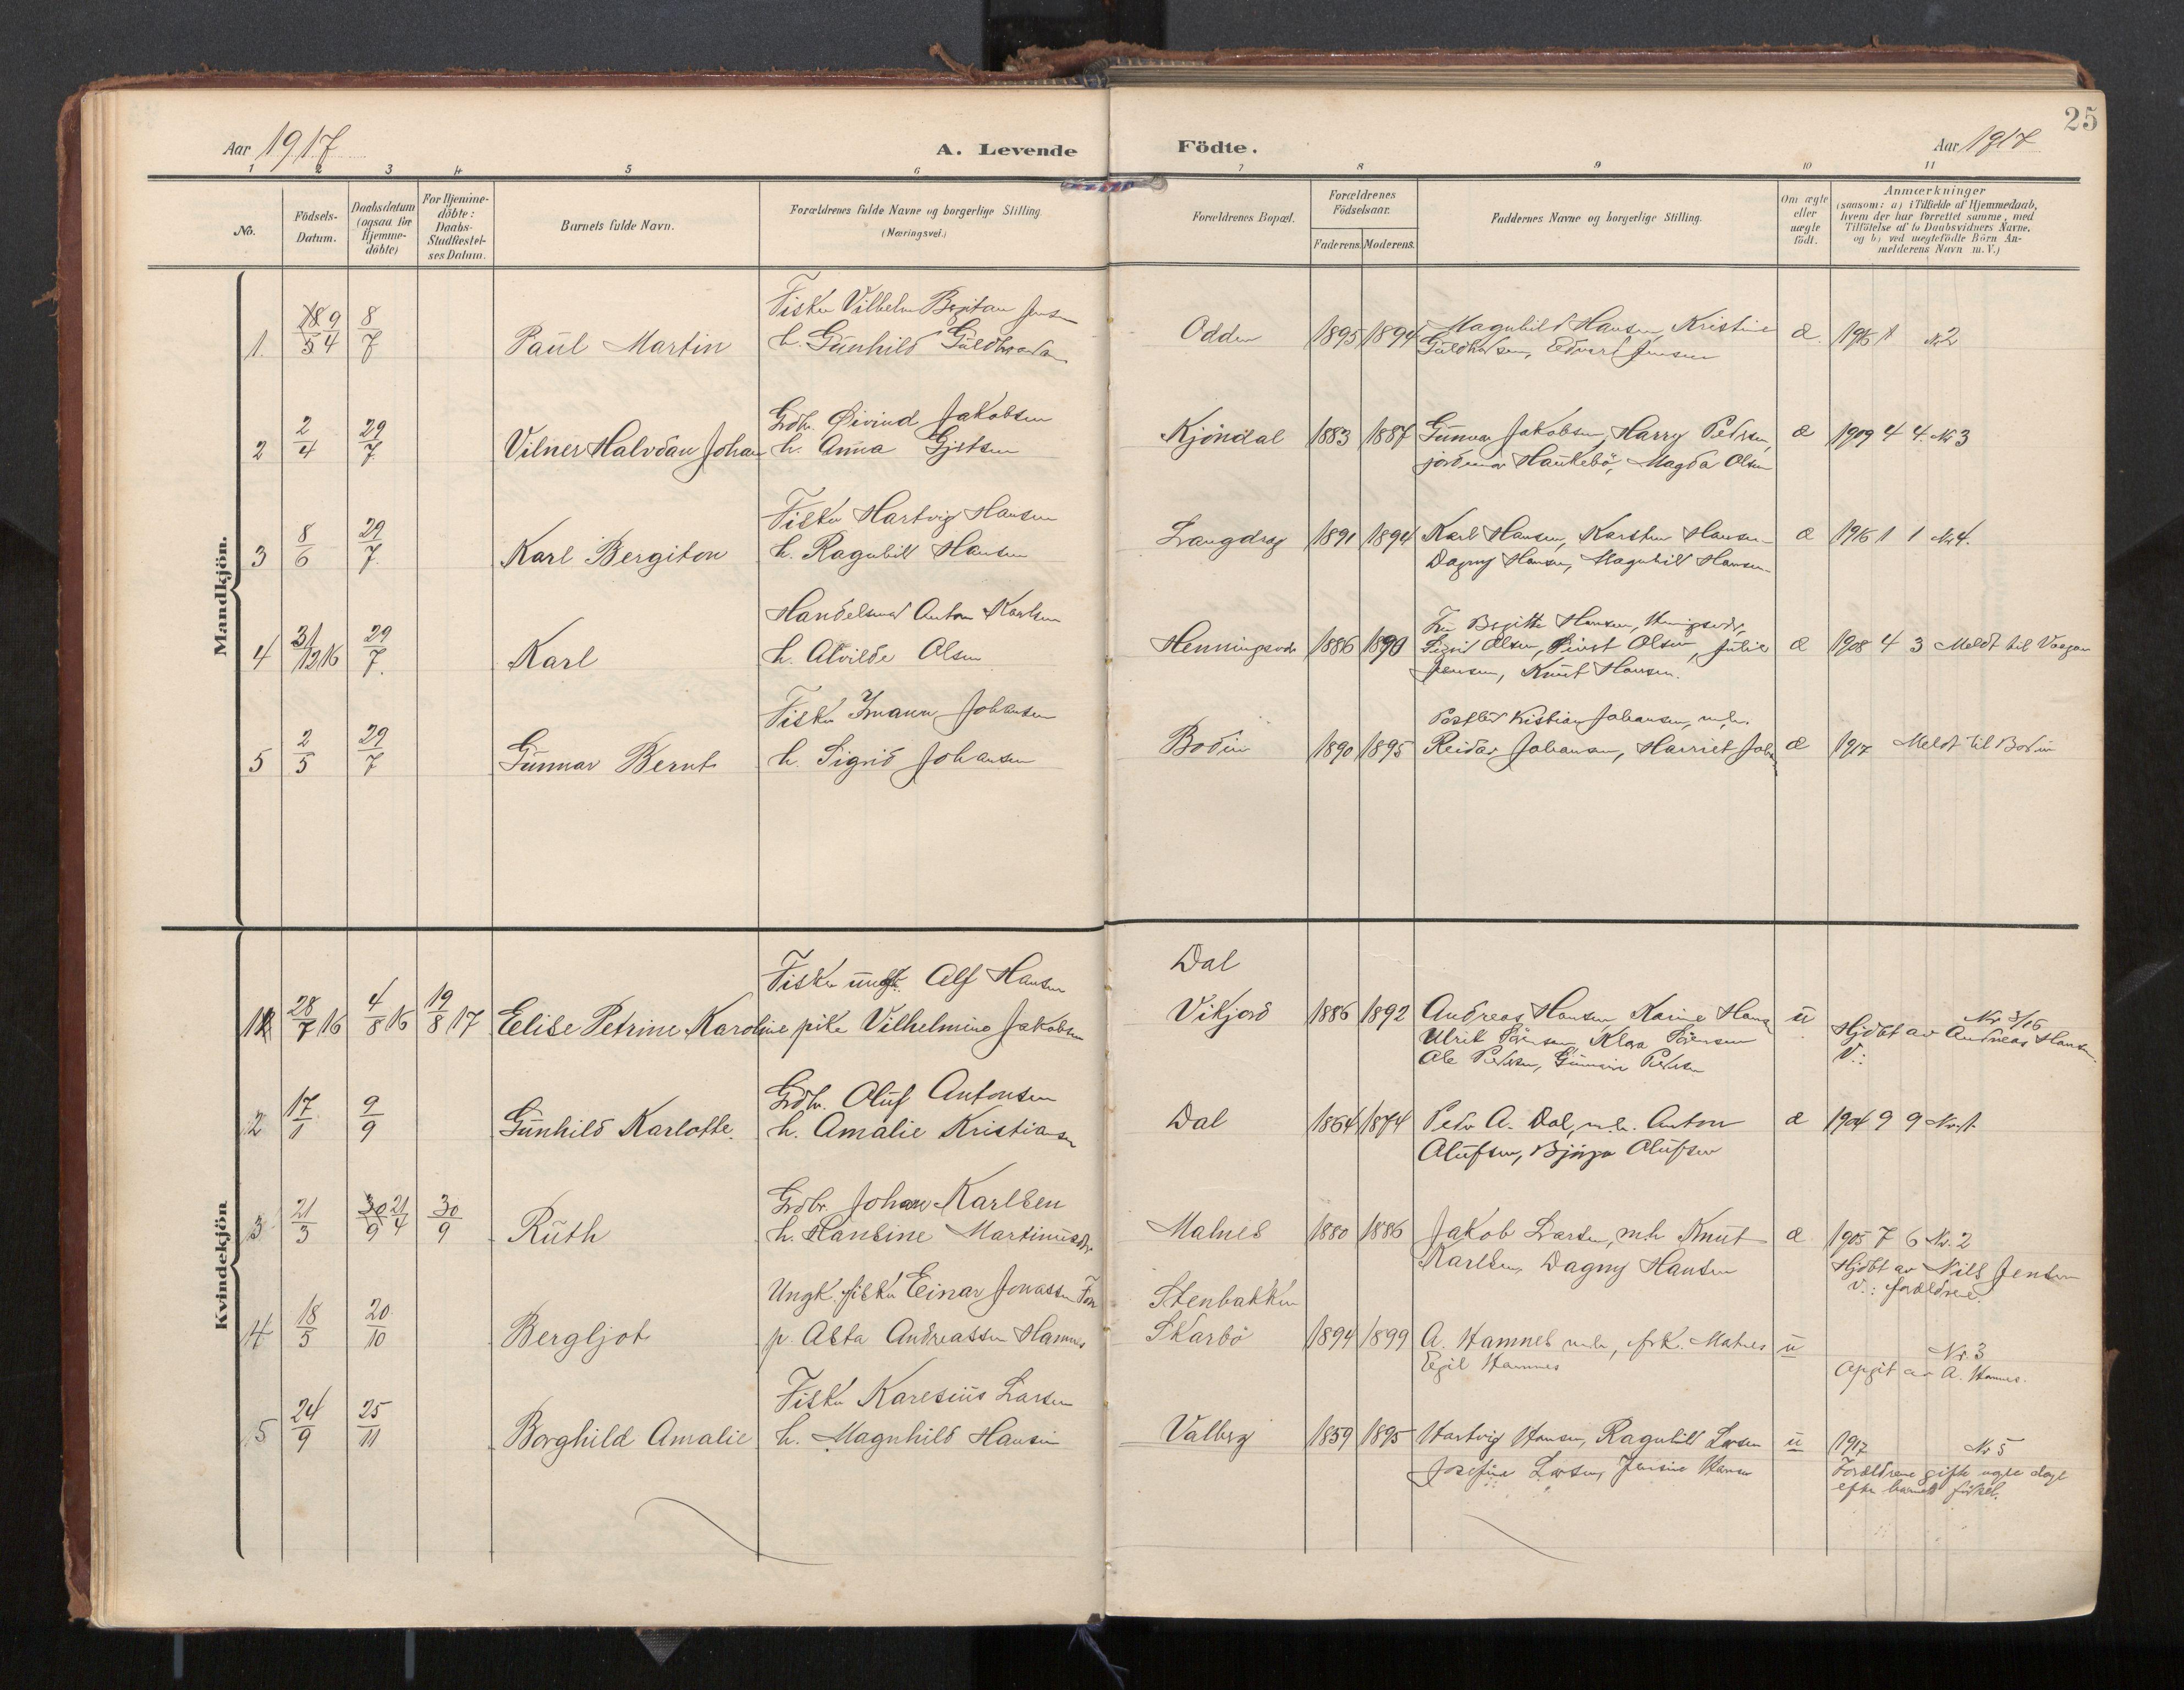 SAT, Ministerialprotokoller, klokkerbøker og fødselsregistre - Nordland, 884/L1194: Ministerialbok nr. 884A02, 1906-1937, s. 25